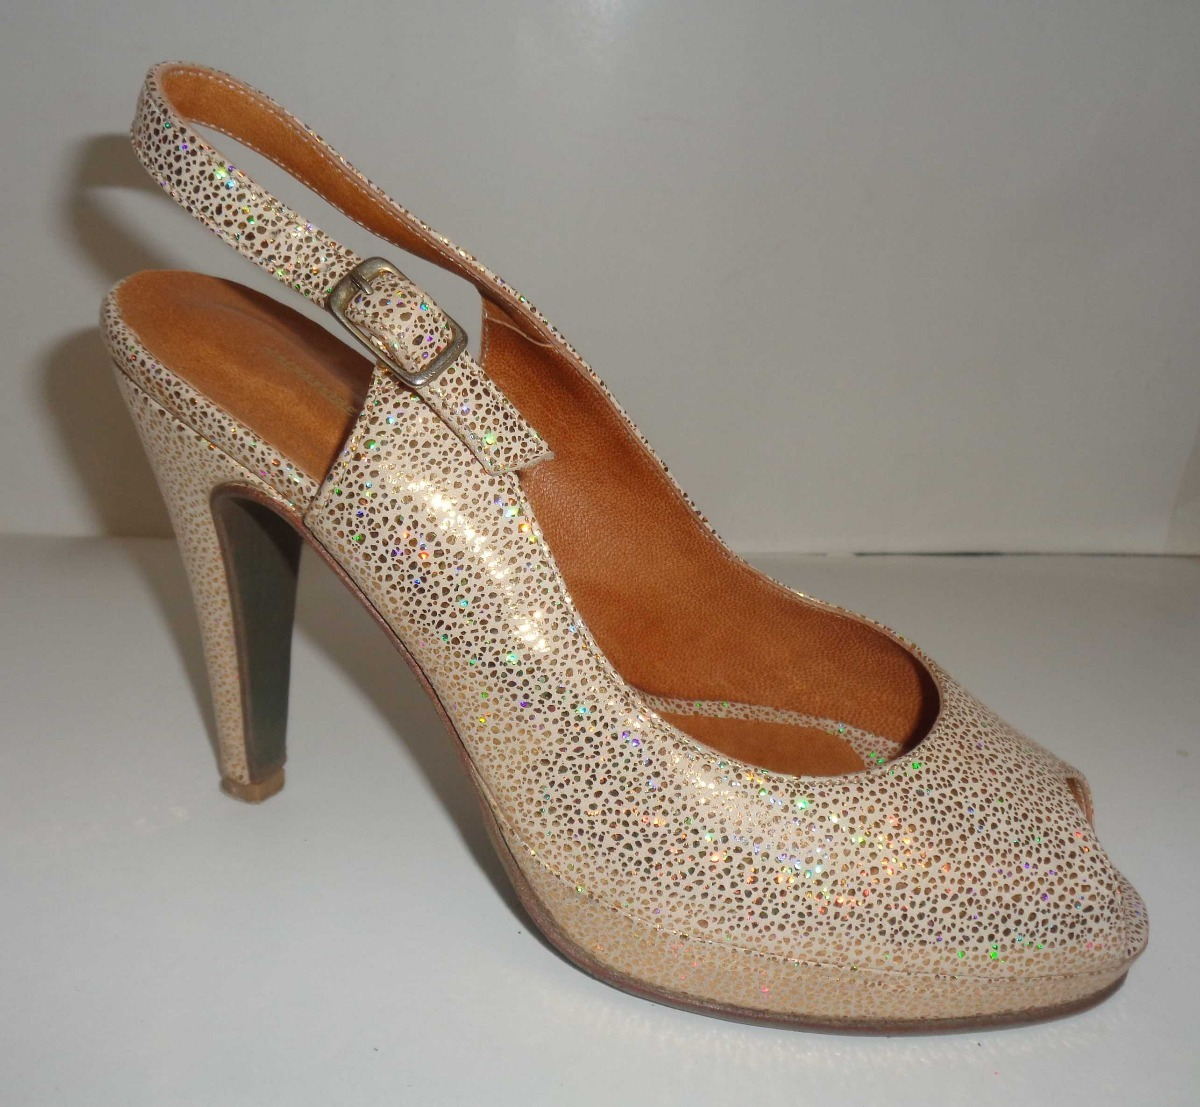 36 Dorados 800 00 Sandalias Zapatos Fiesta Stilettos Plataforma gXZzT